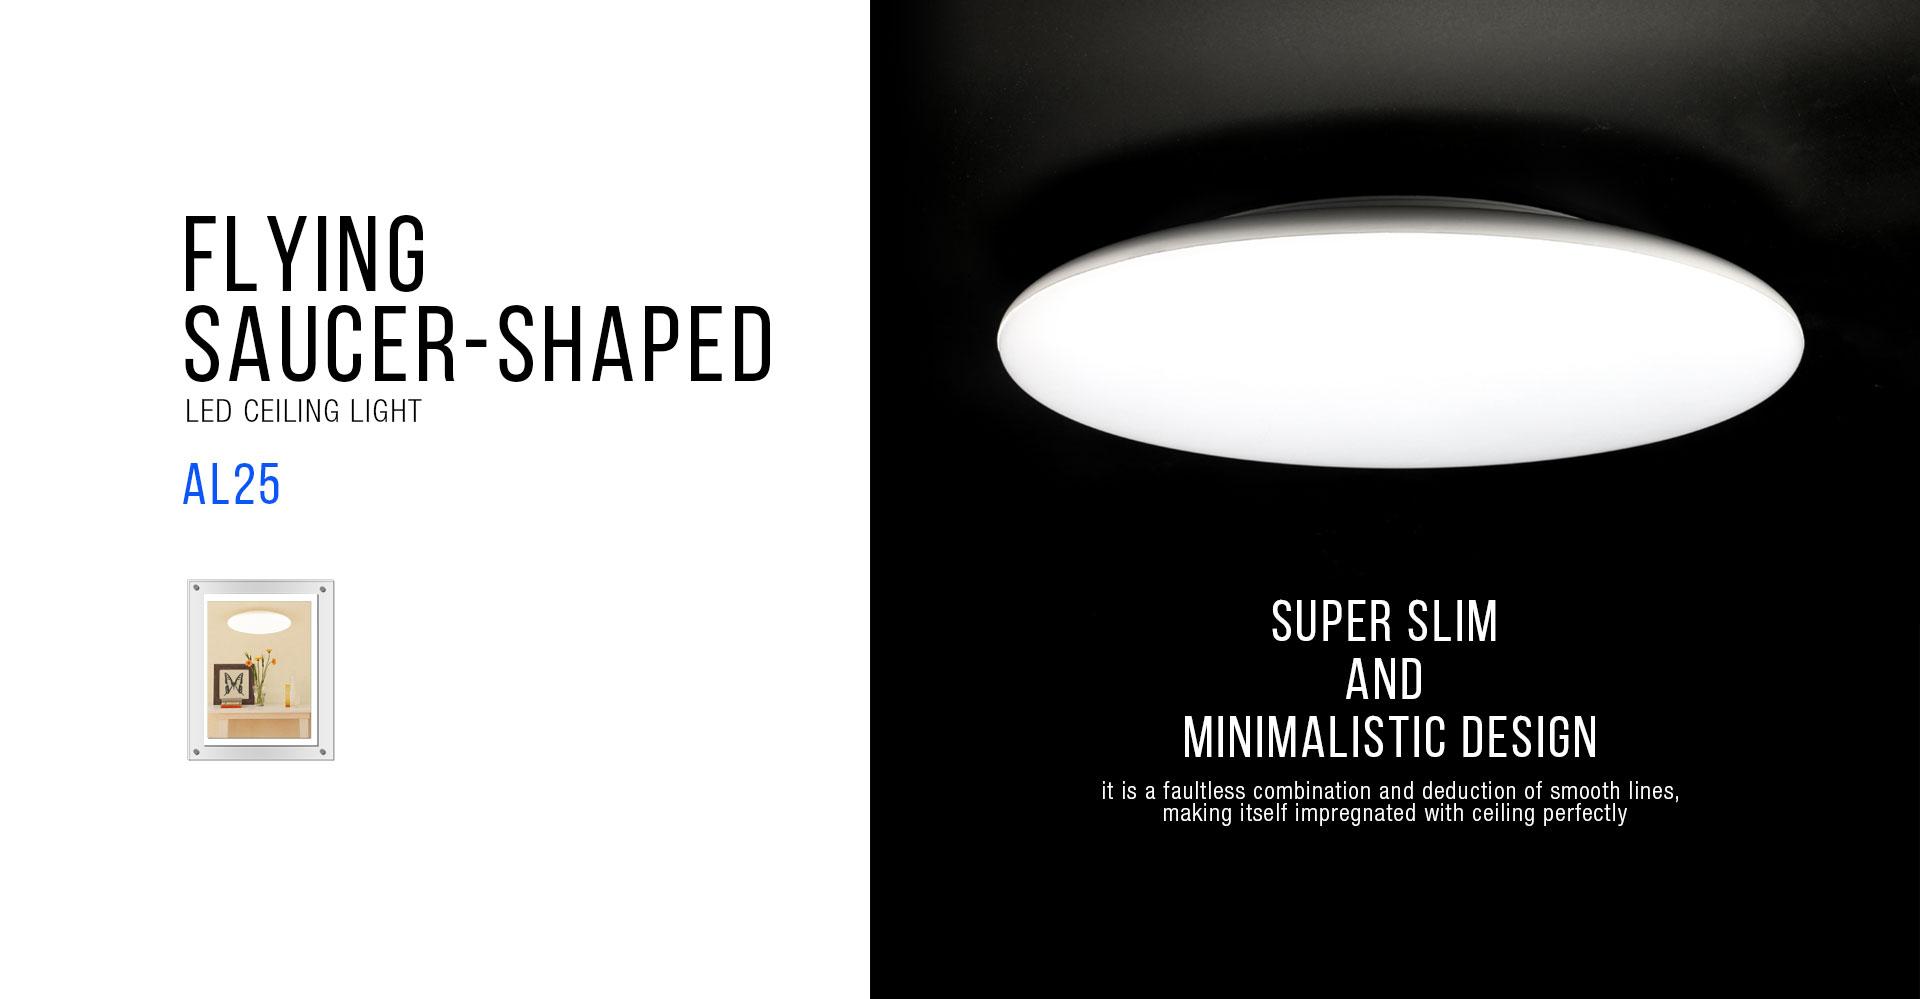 Al25 led ceiling light upshine lighting al25 flying saucer shaped led ceiling light01 arubaitofo Images